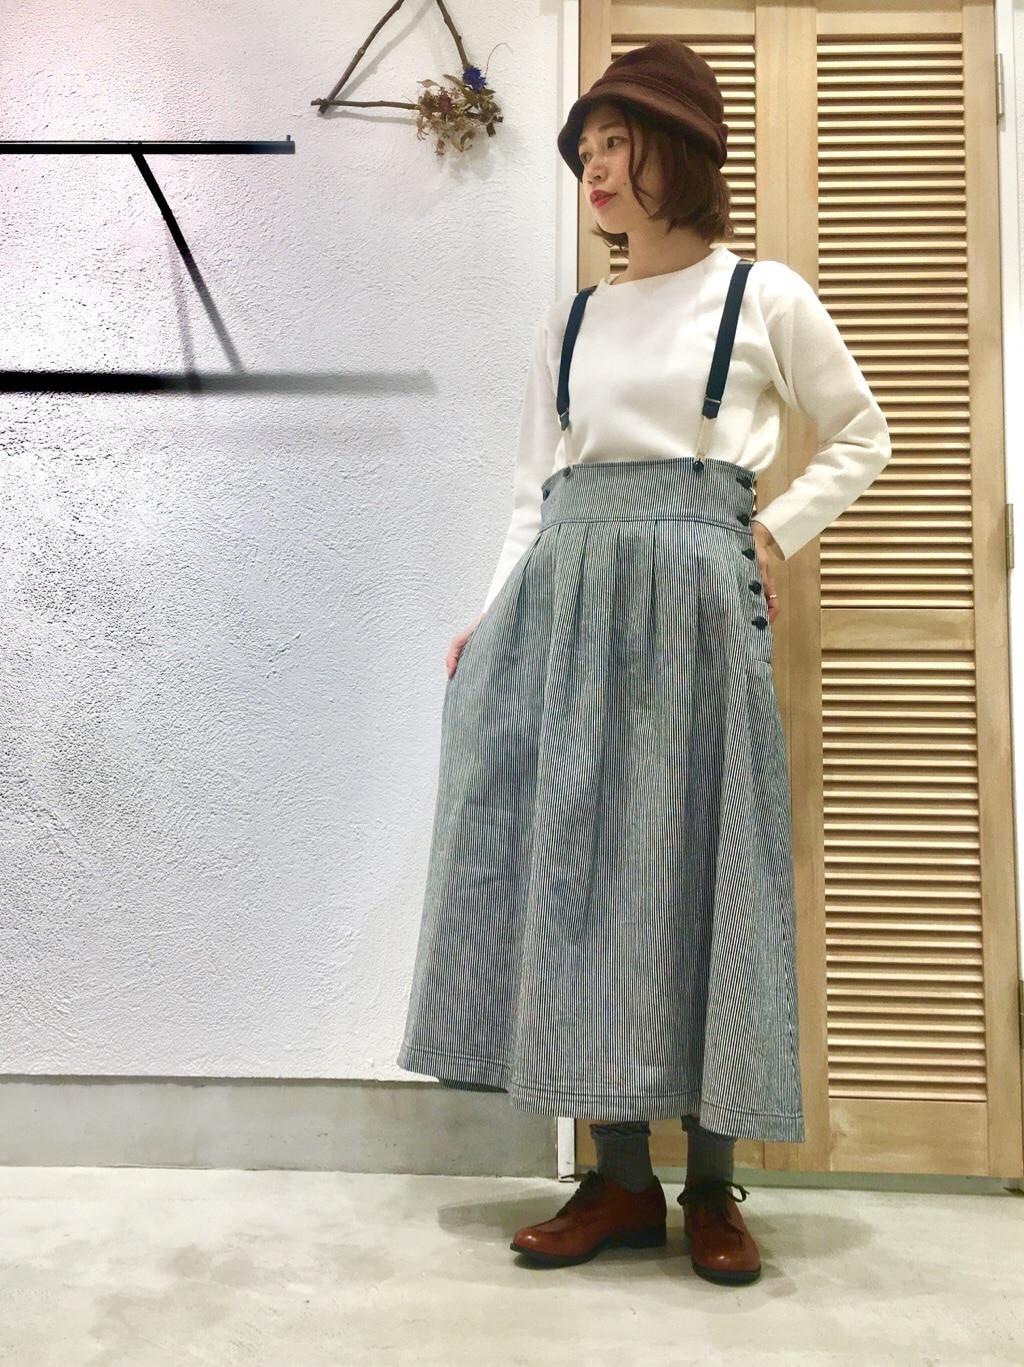 chambre de charme 横浜ジョイナス 身長:160cm 2021.02.06